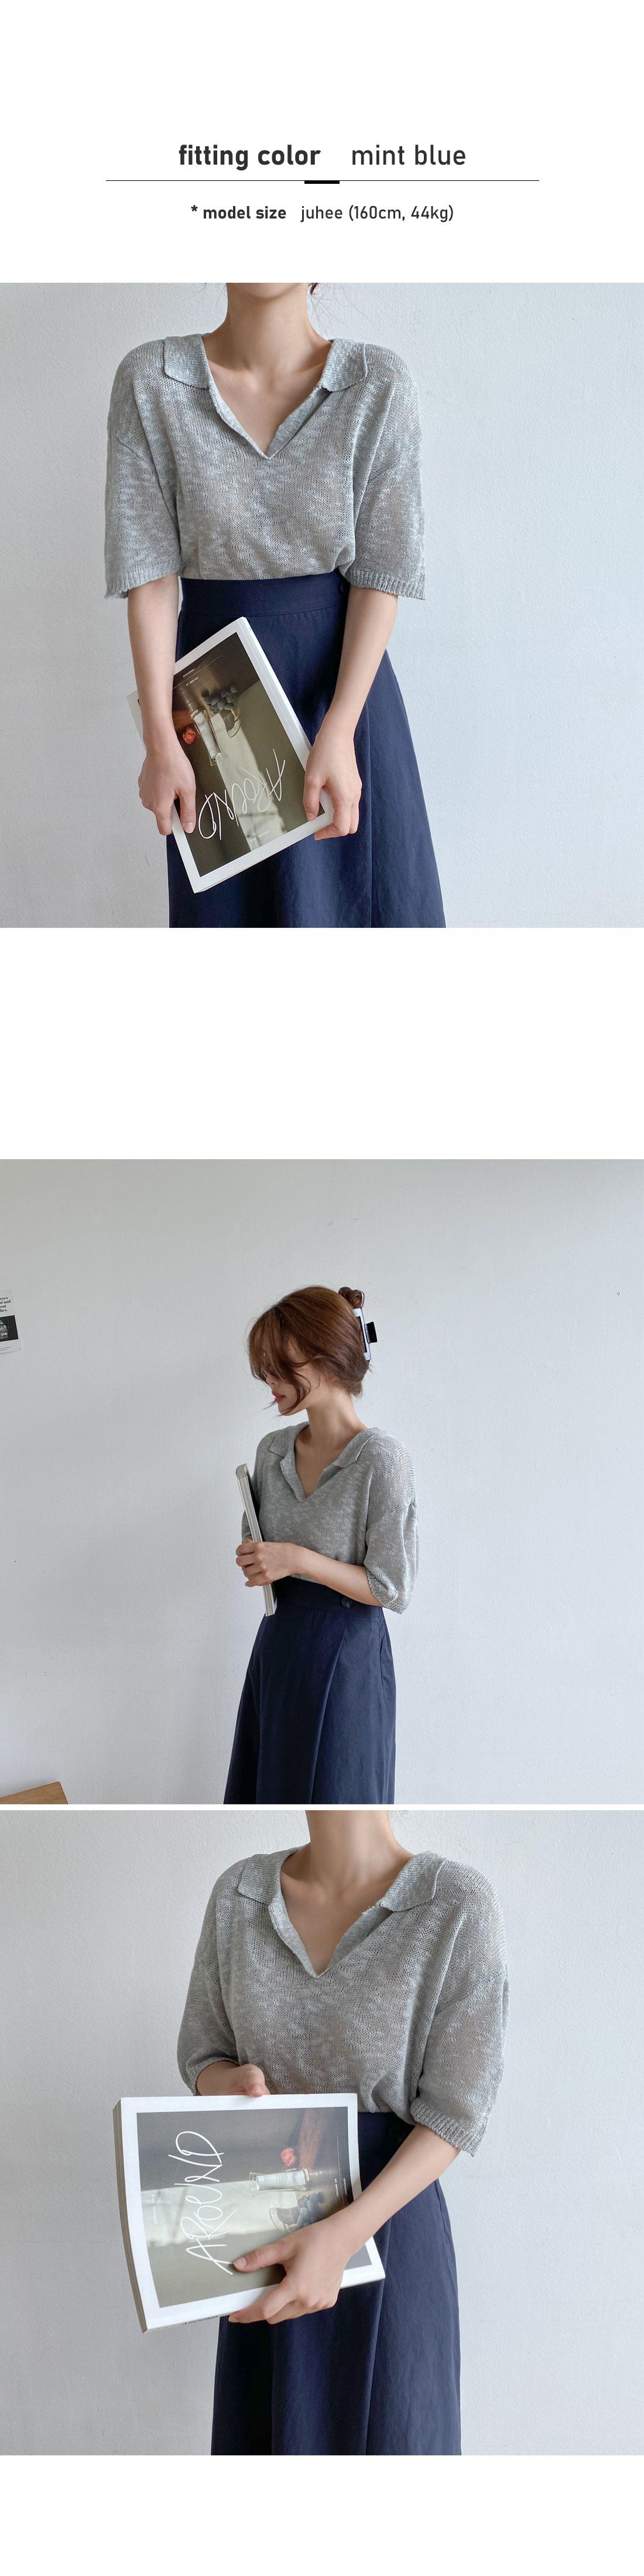 Snow Slab Collar Knitwear - Black, Mint Blue Same Day Shipping